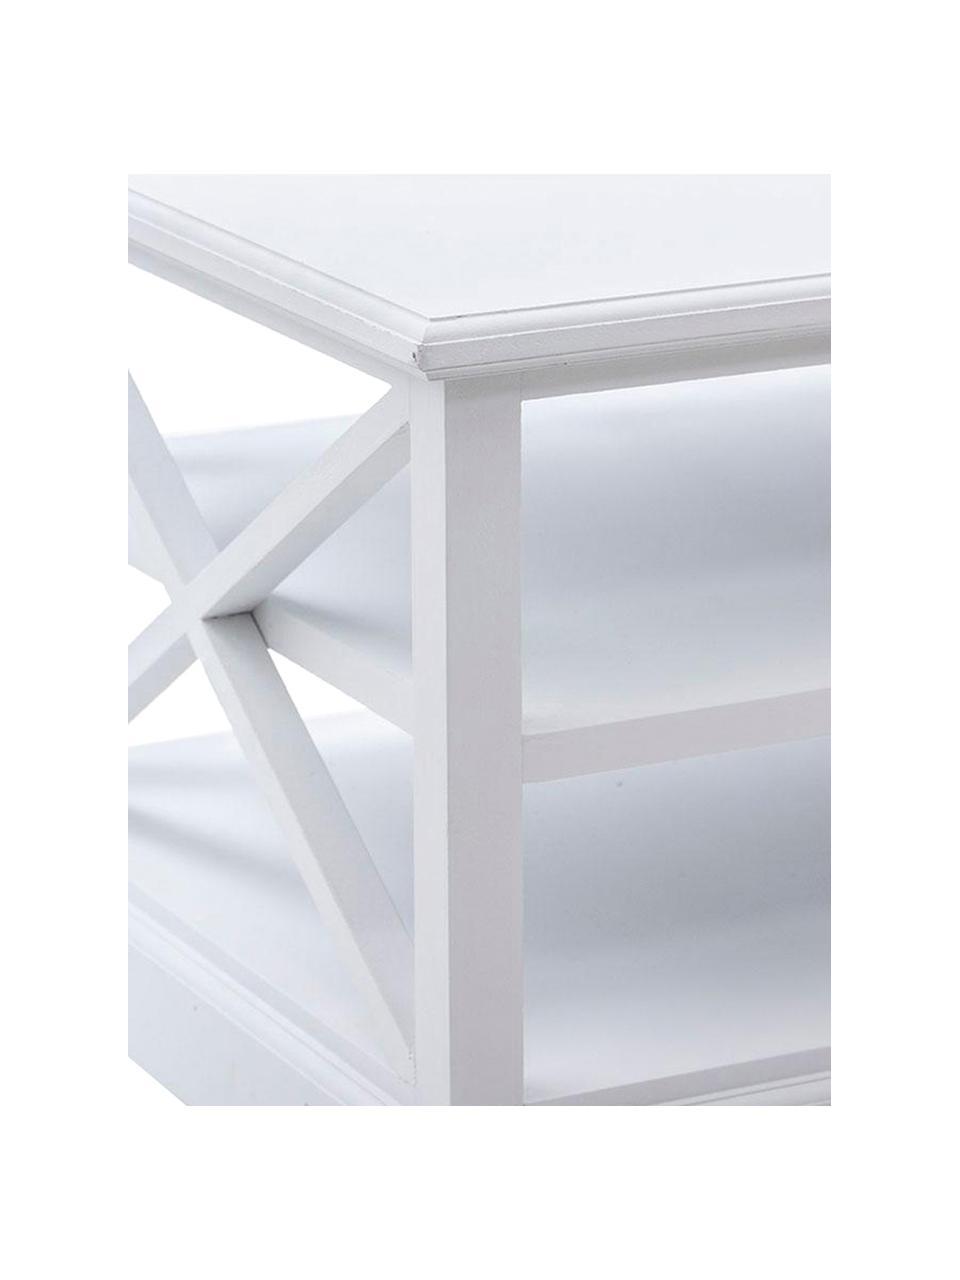 Mesa de centro Combi, Estructura: madera de paulownia, made, Tablero: firbas de densidad media , Blanco, beige, An 120 x Al 51 cm